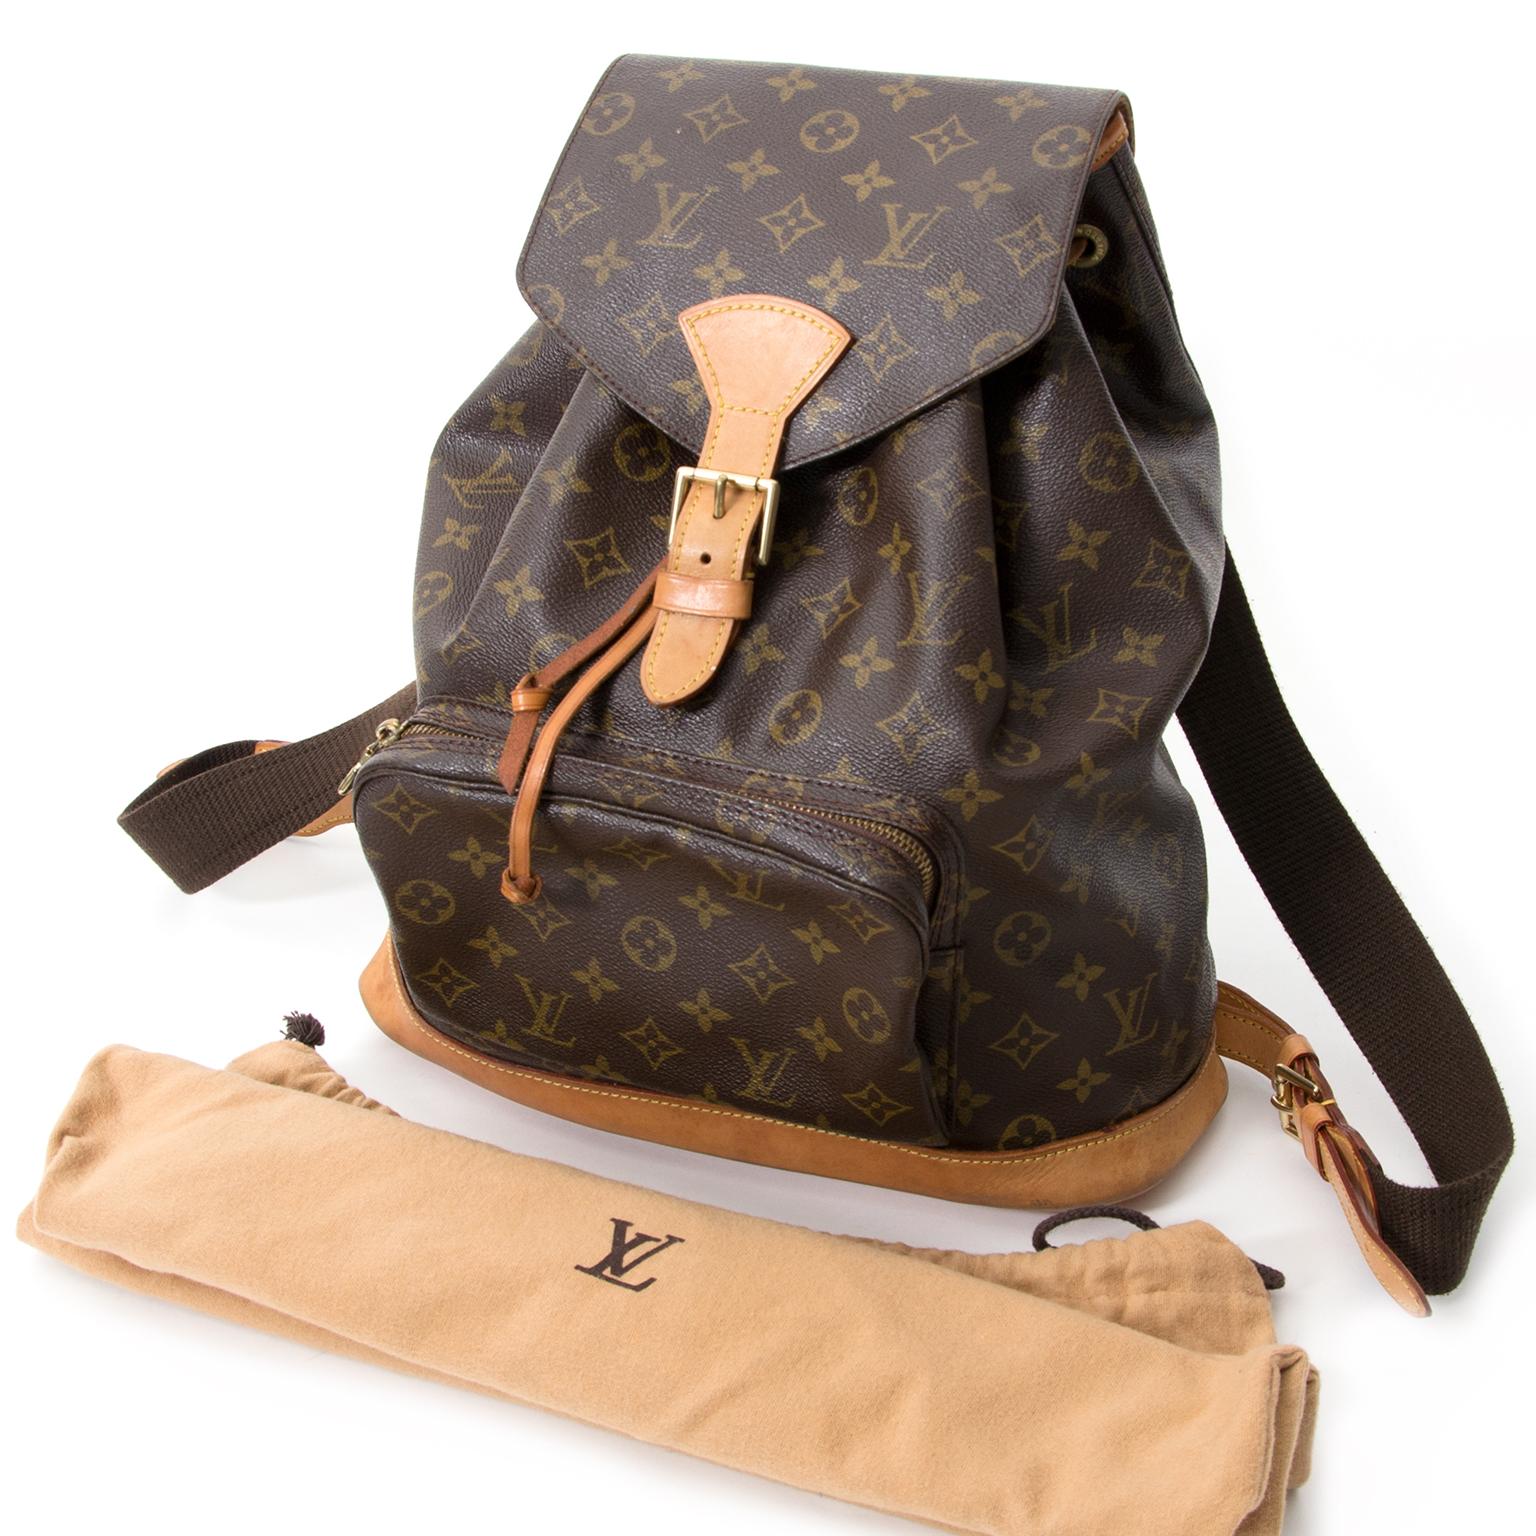 268260db64 ... sac a main Louis Vuitton Monogram. buy safe online secondhand Louis  Vuitton Monogram Backpack best price like new , acheter en linge